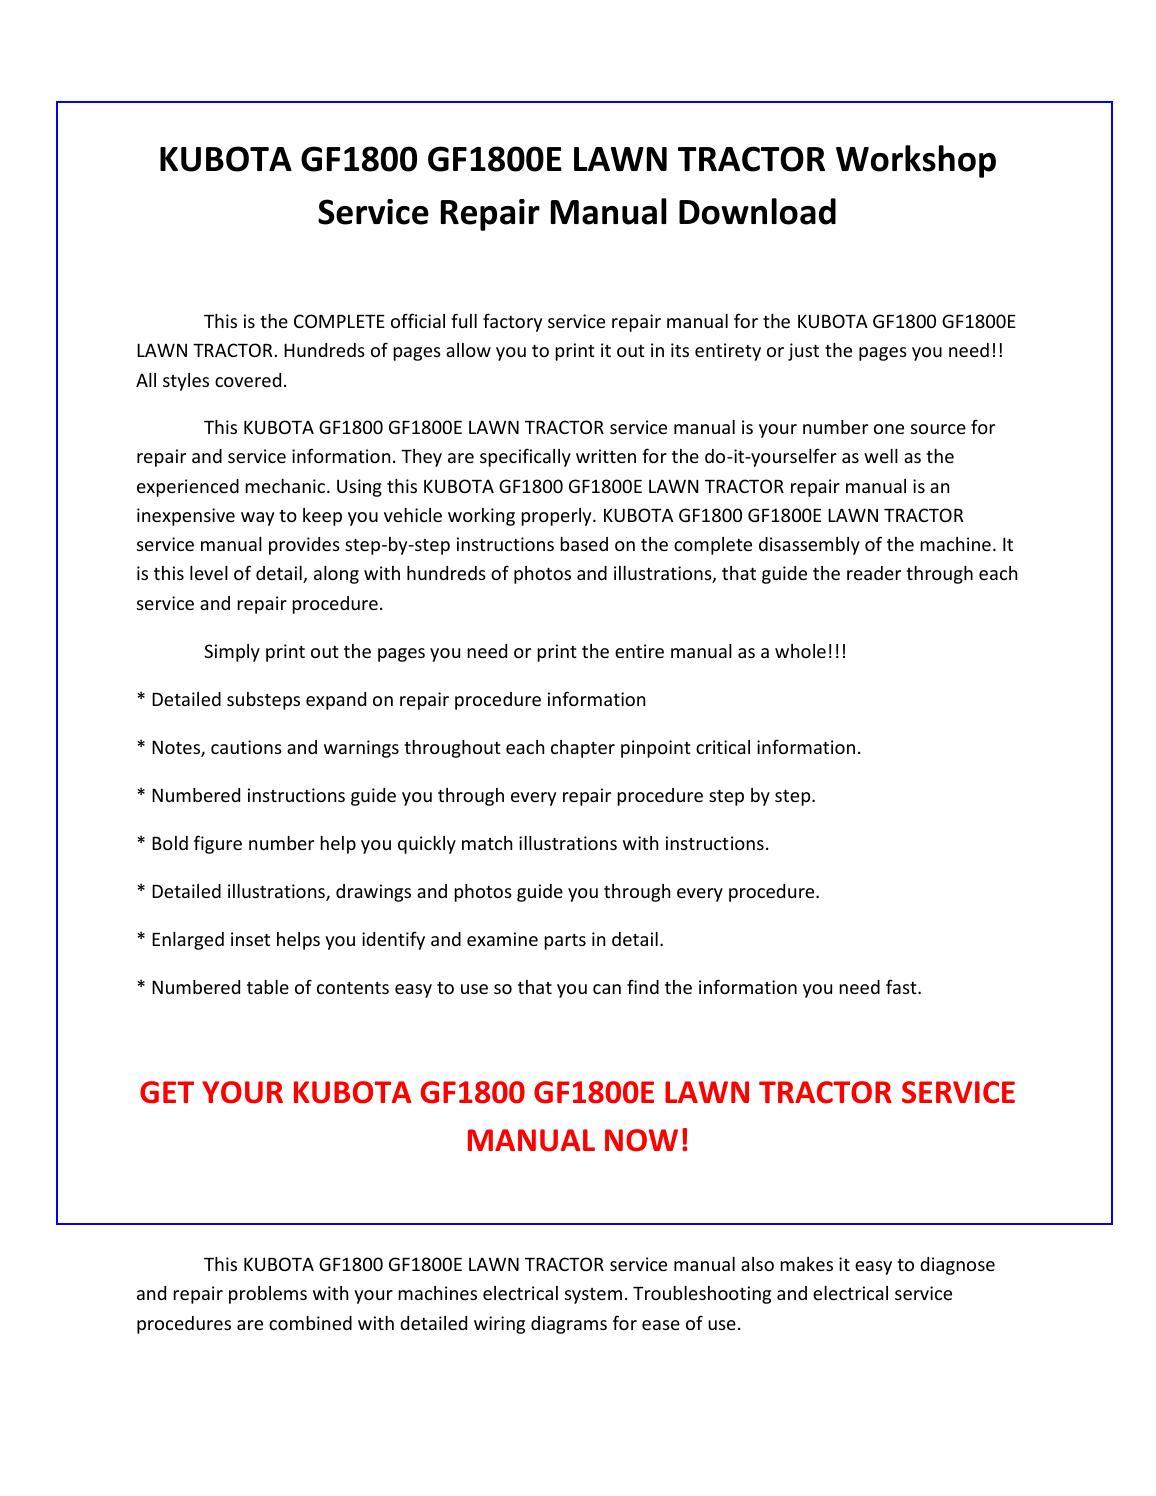 Kubota gf1800 gf1800e lawn tractor service repair manual pdf download by  sparchita3 - issuu